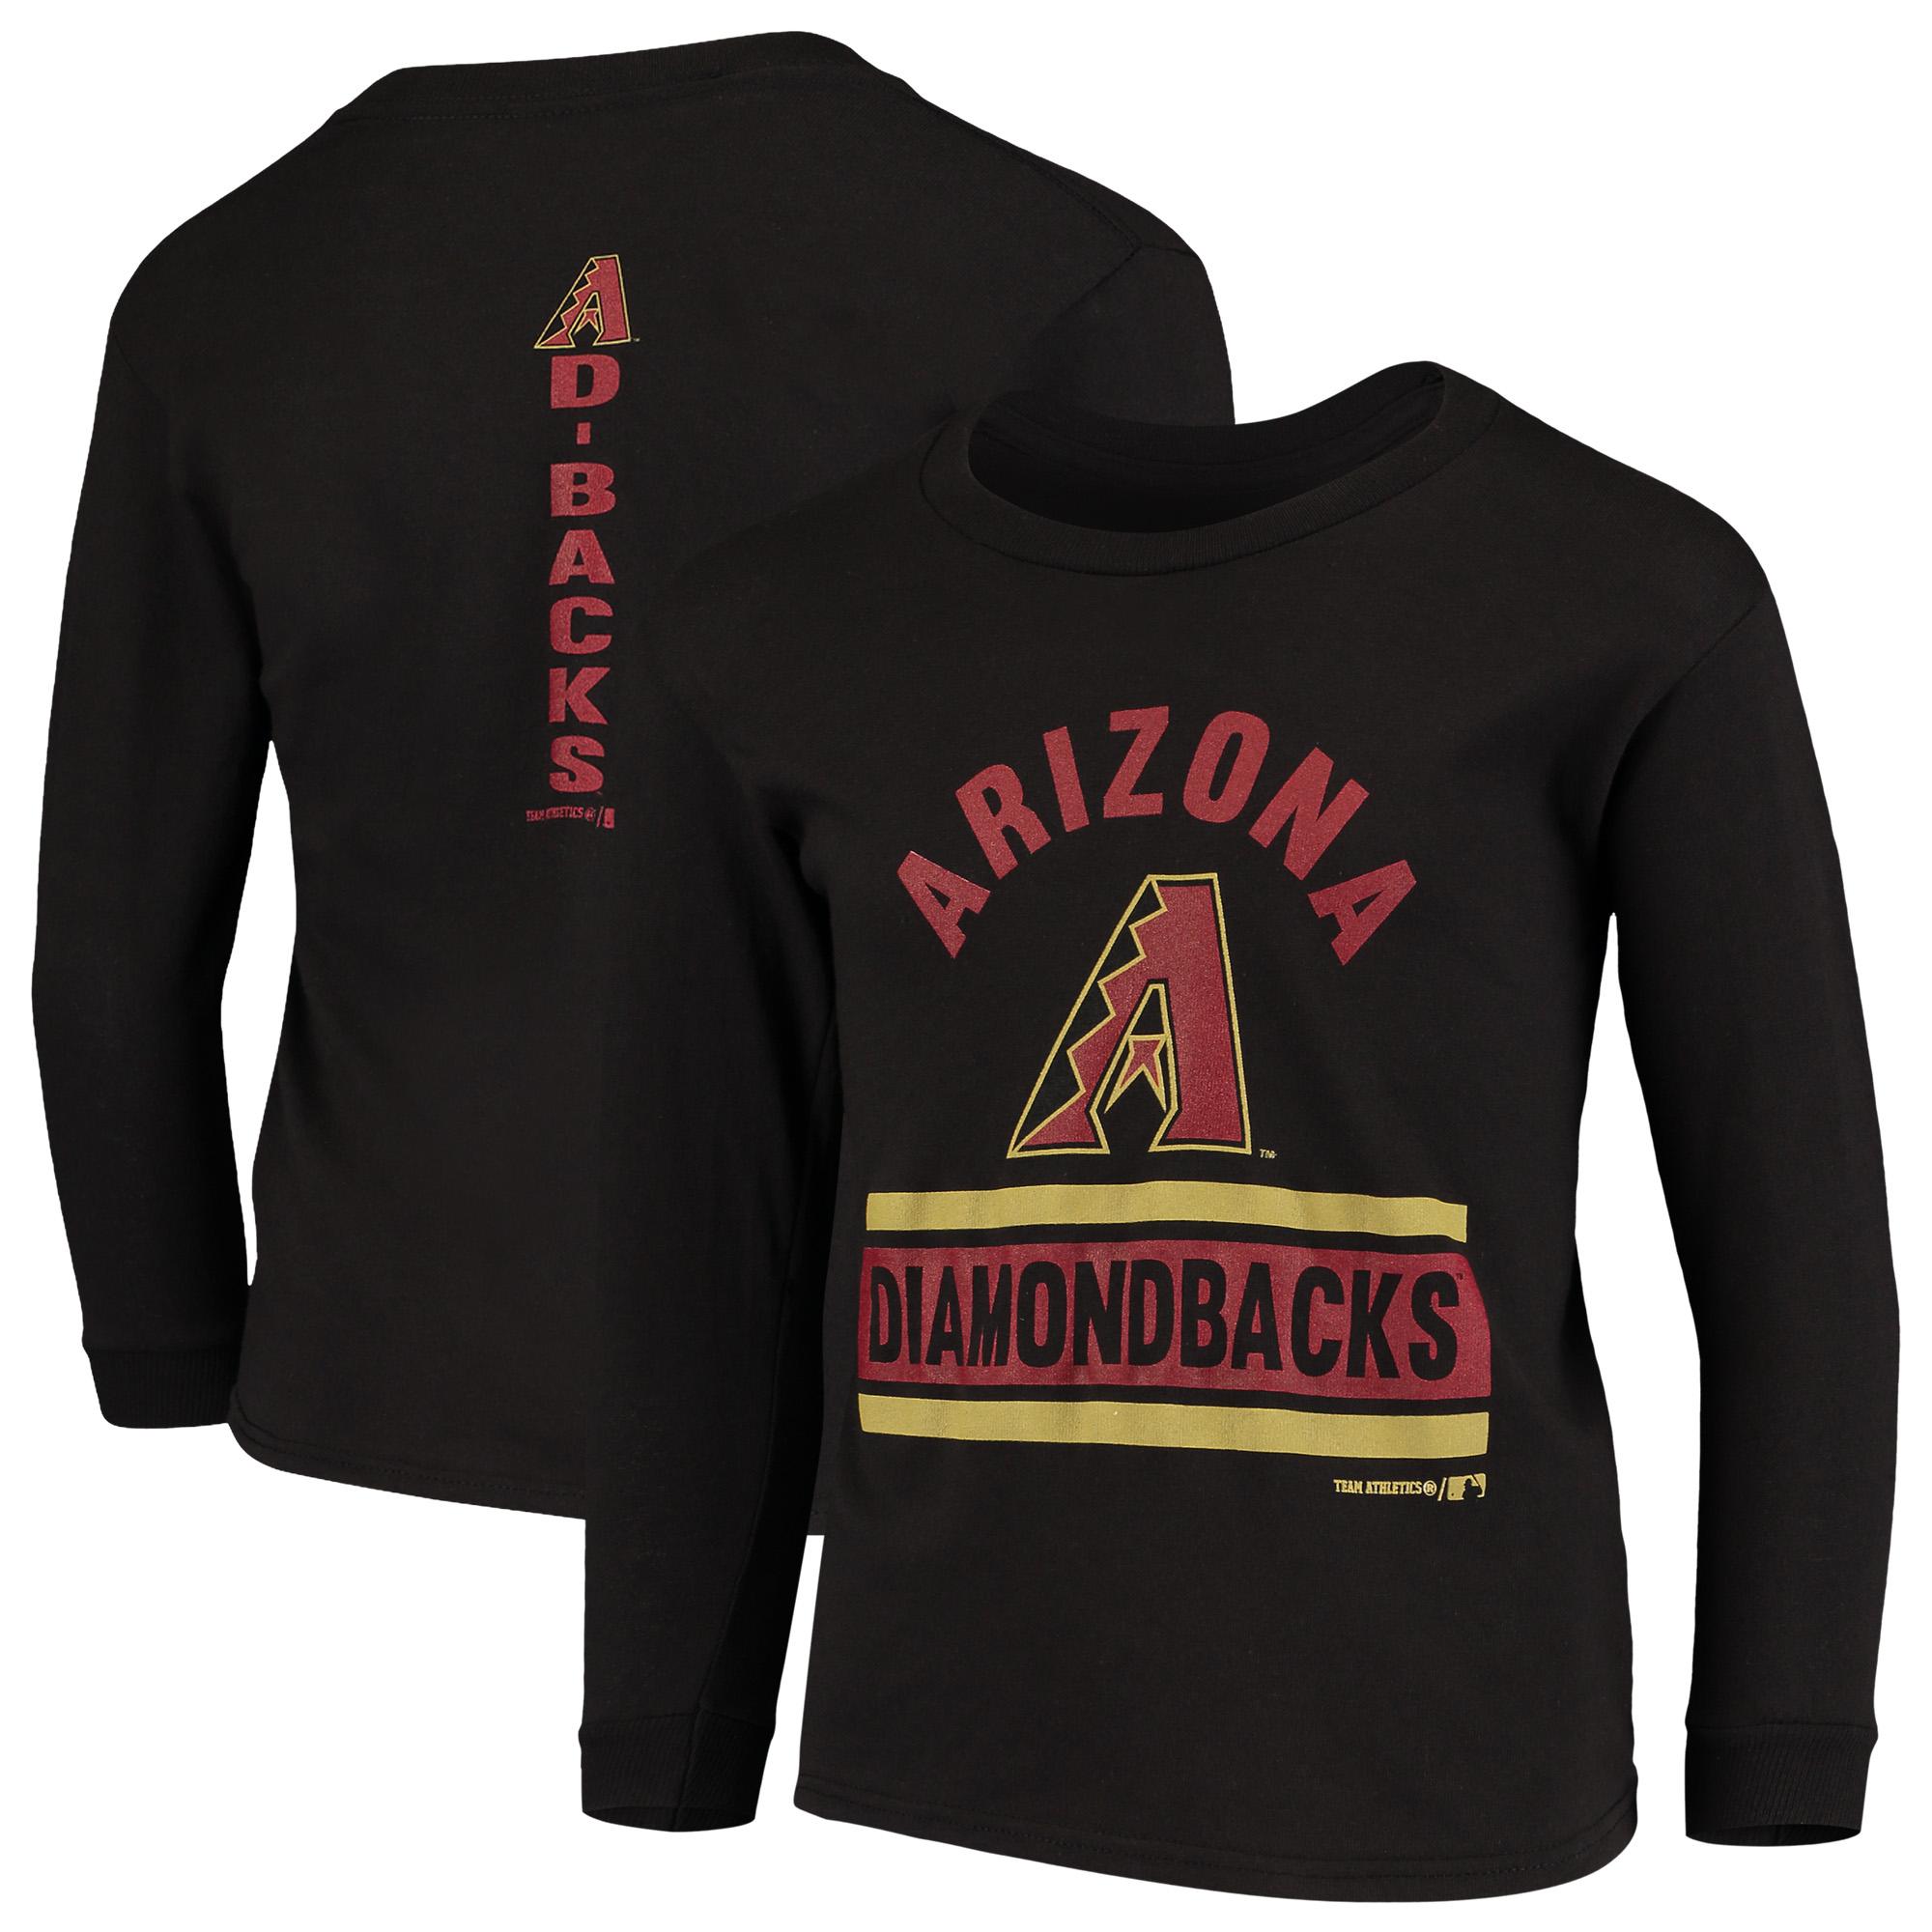 Youth Black Arizona Diamondbacks Basic Long Sleeve T-Shirt